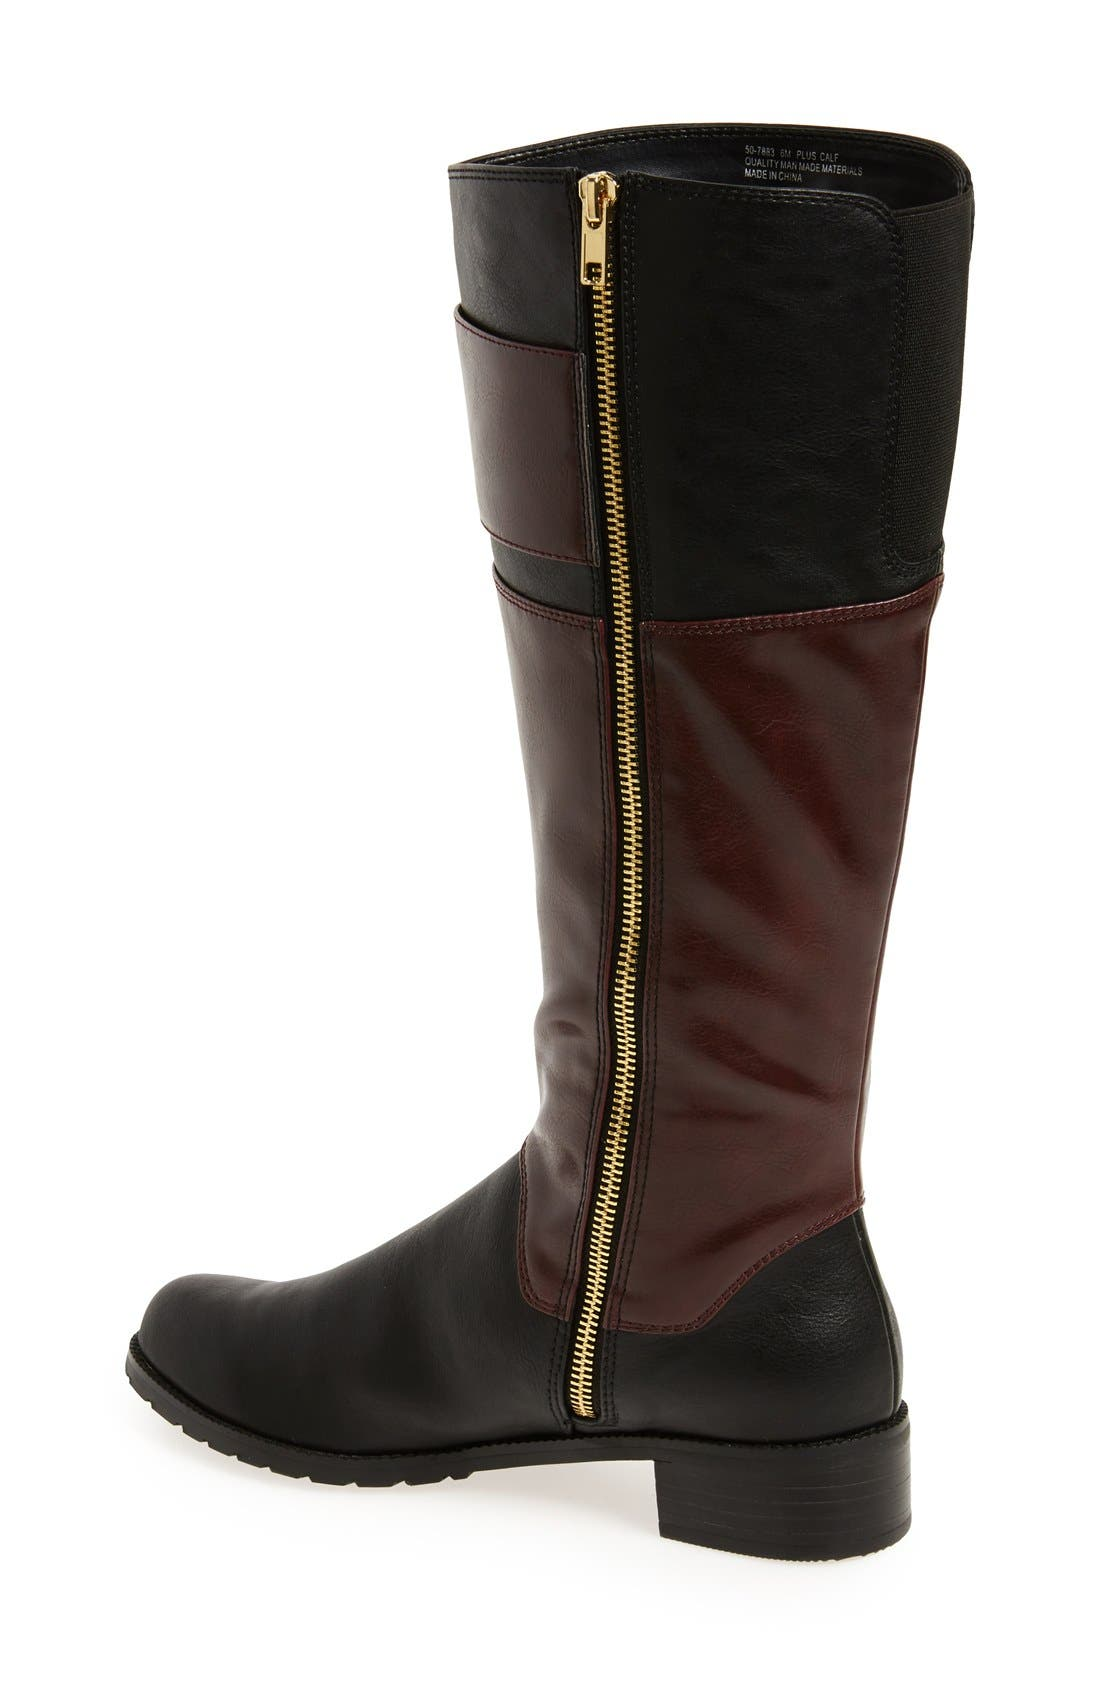 Alternate Image 2  - Bella Vita 'Adriann II' Knee High Boot (Women) (Wide Calf)